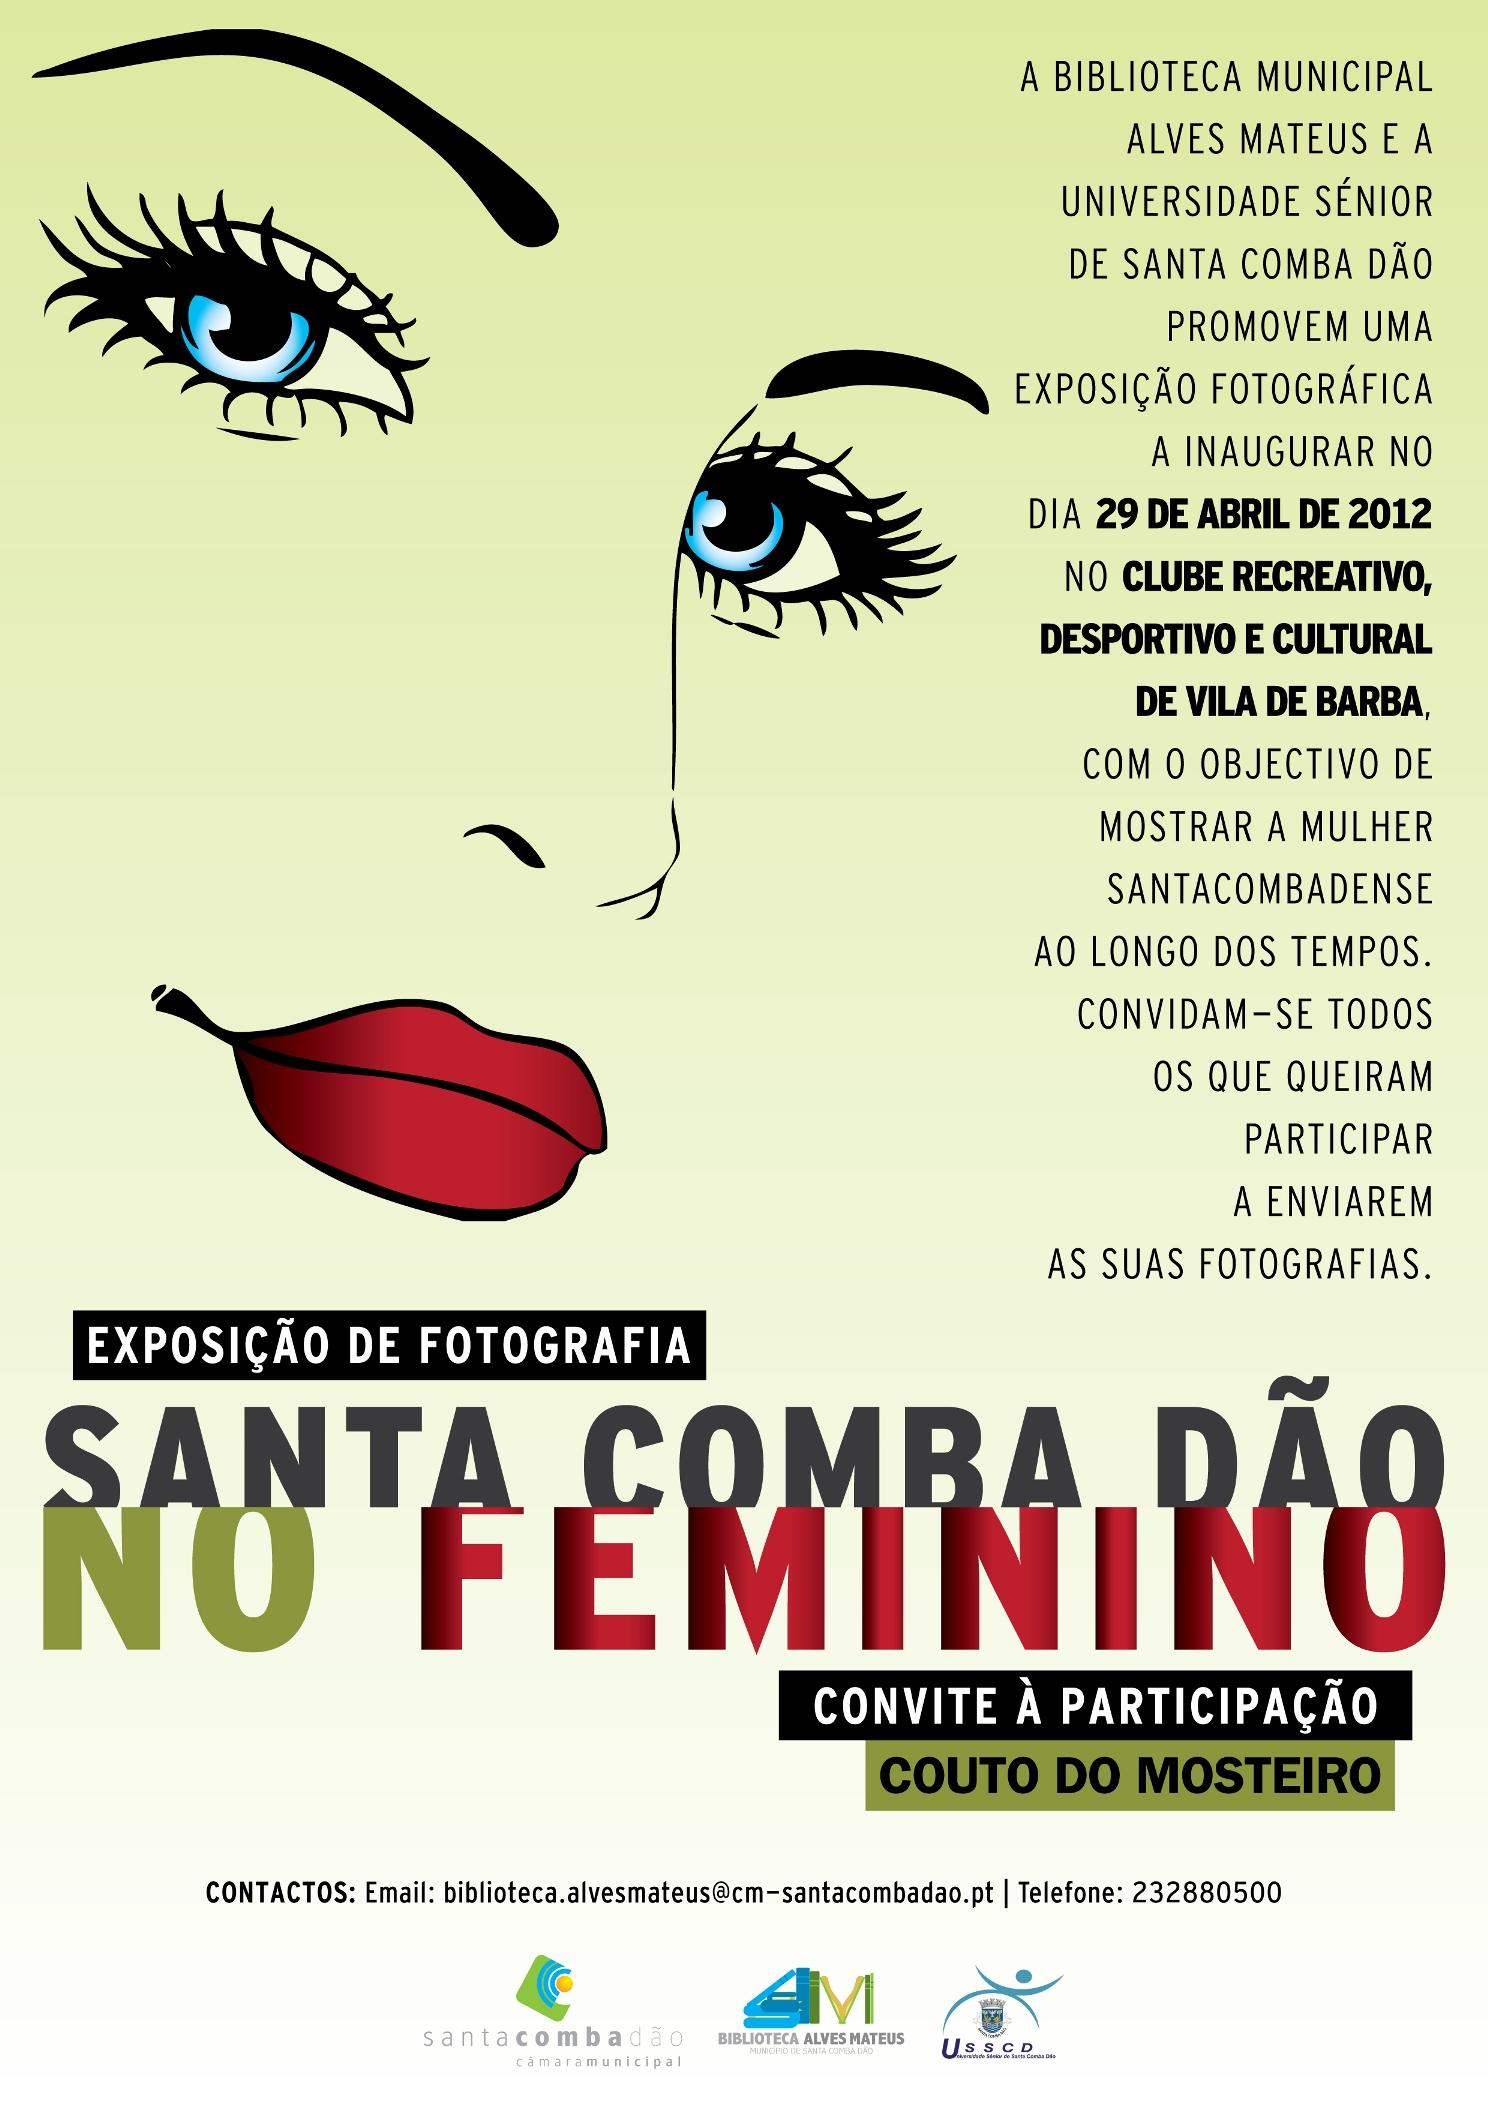 cartaz_scd_feminino_COUTO-01